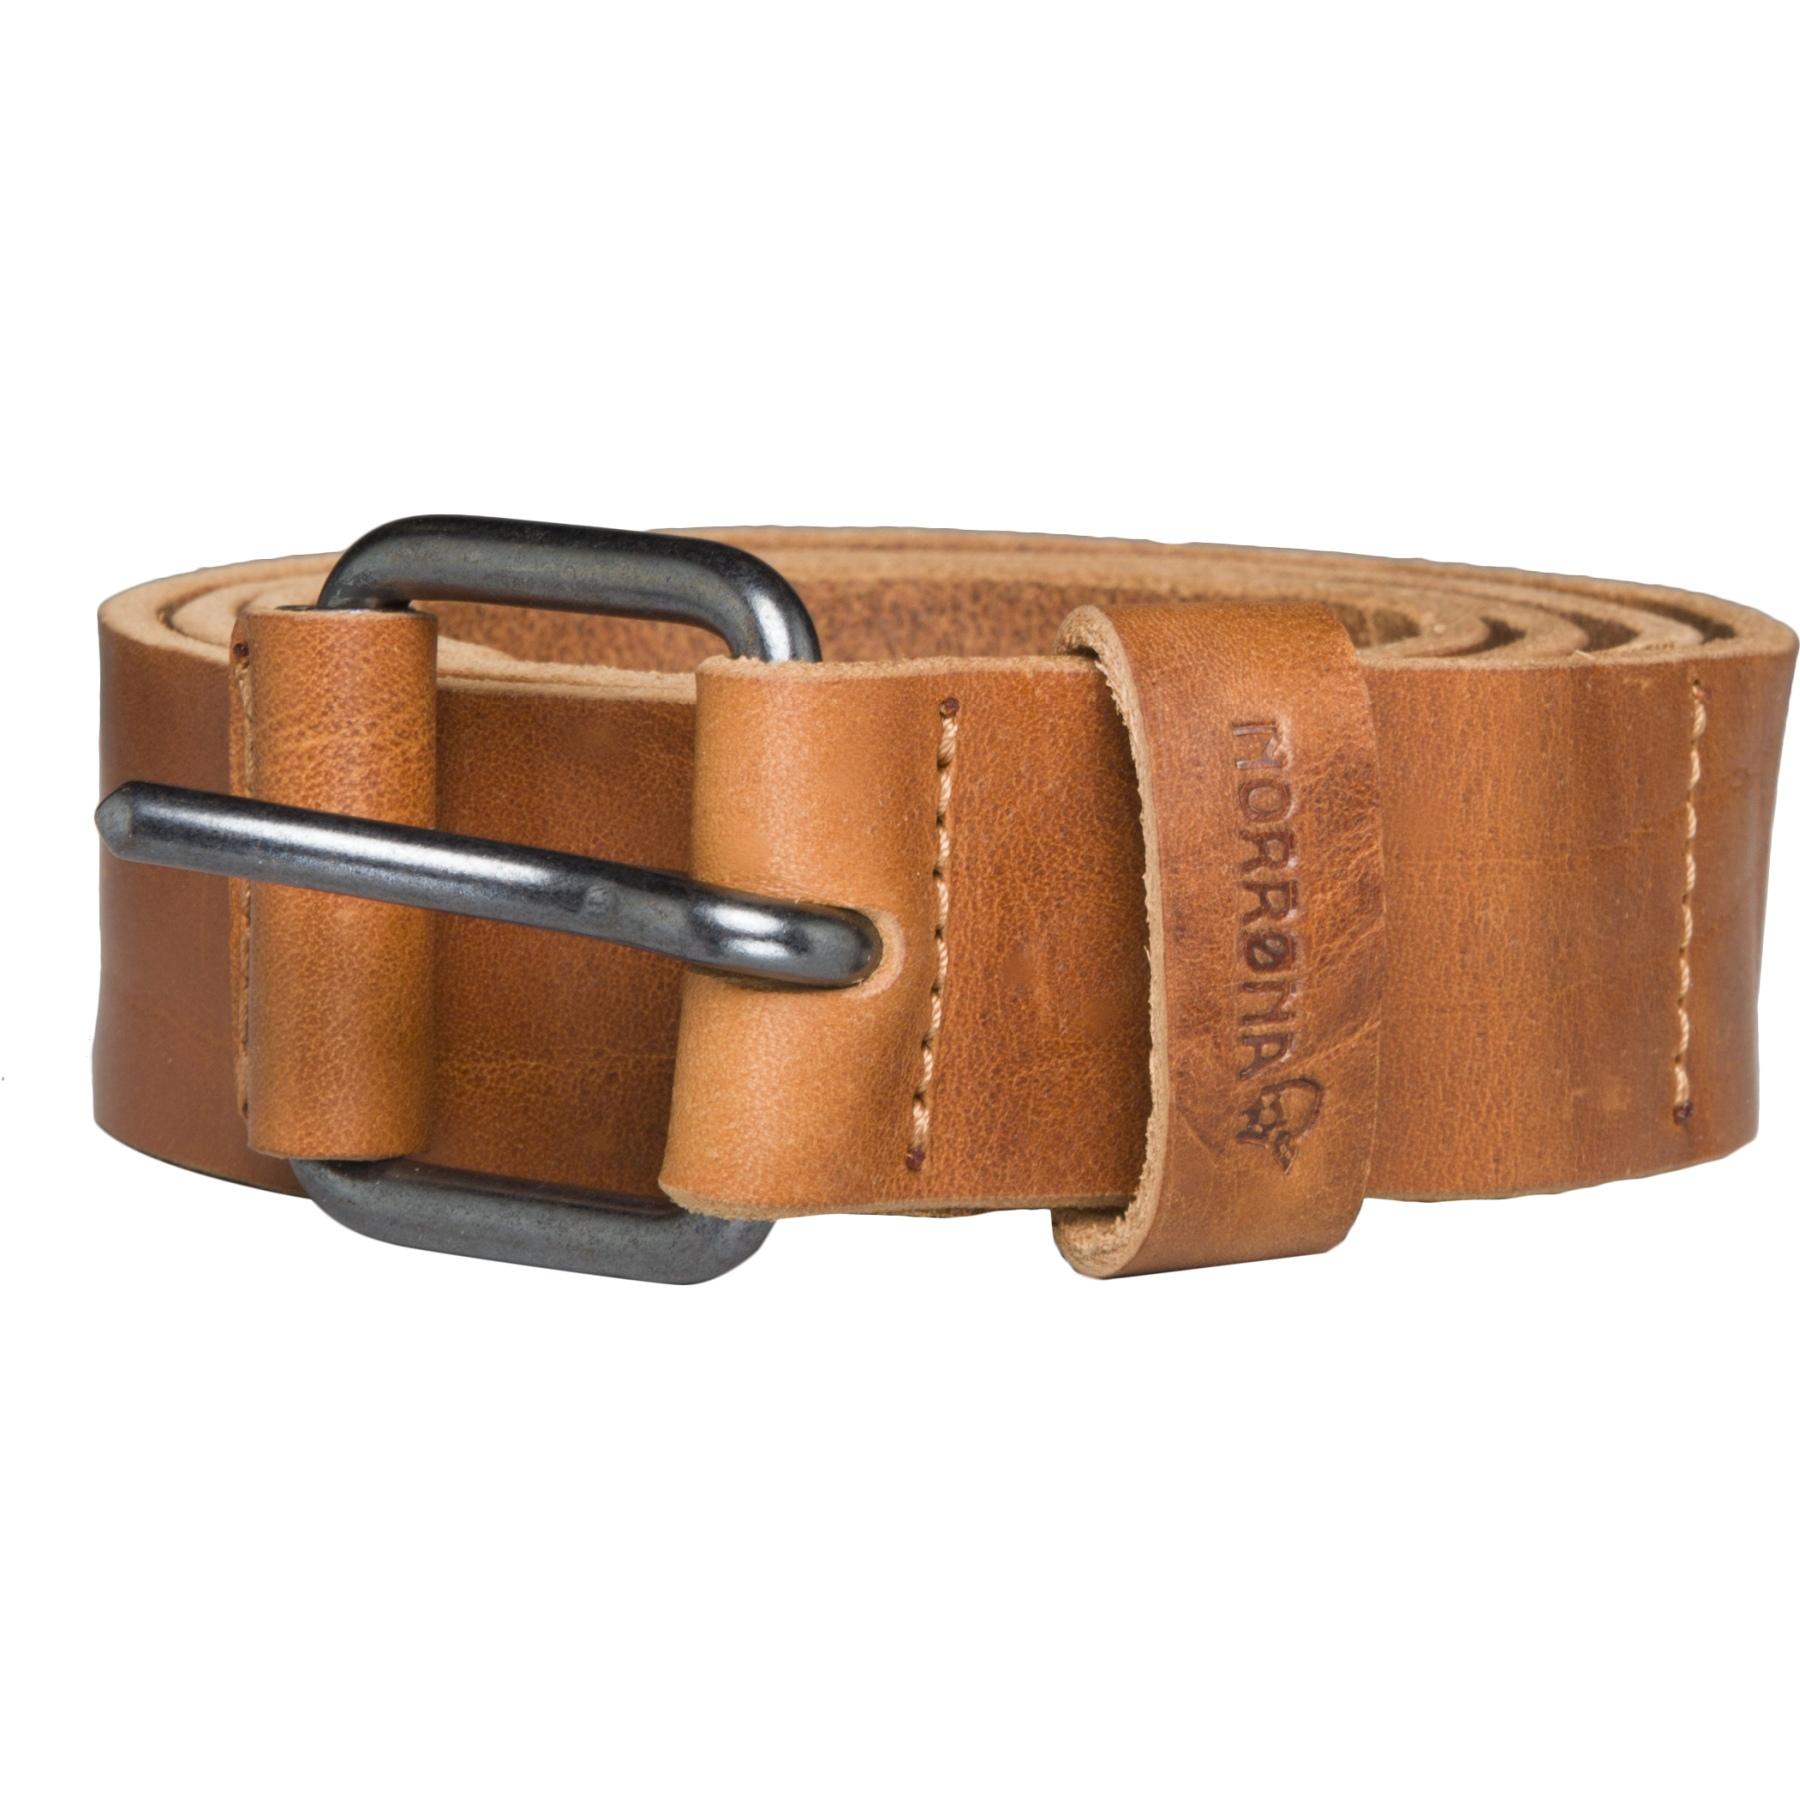 Norrona /29 leather Belt - Brown